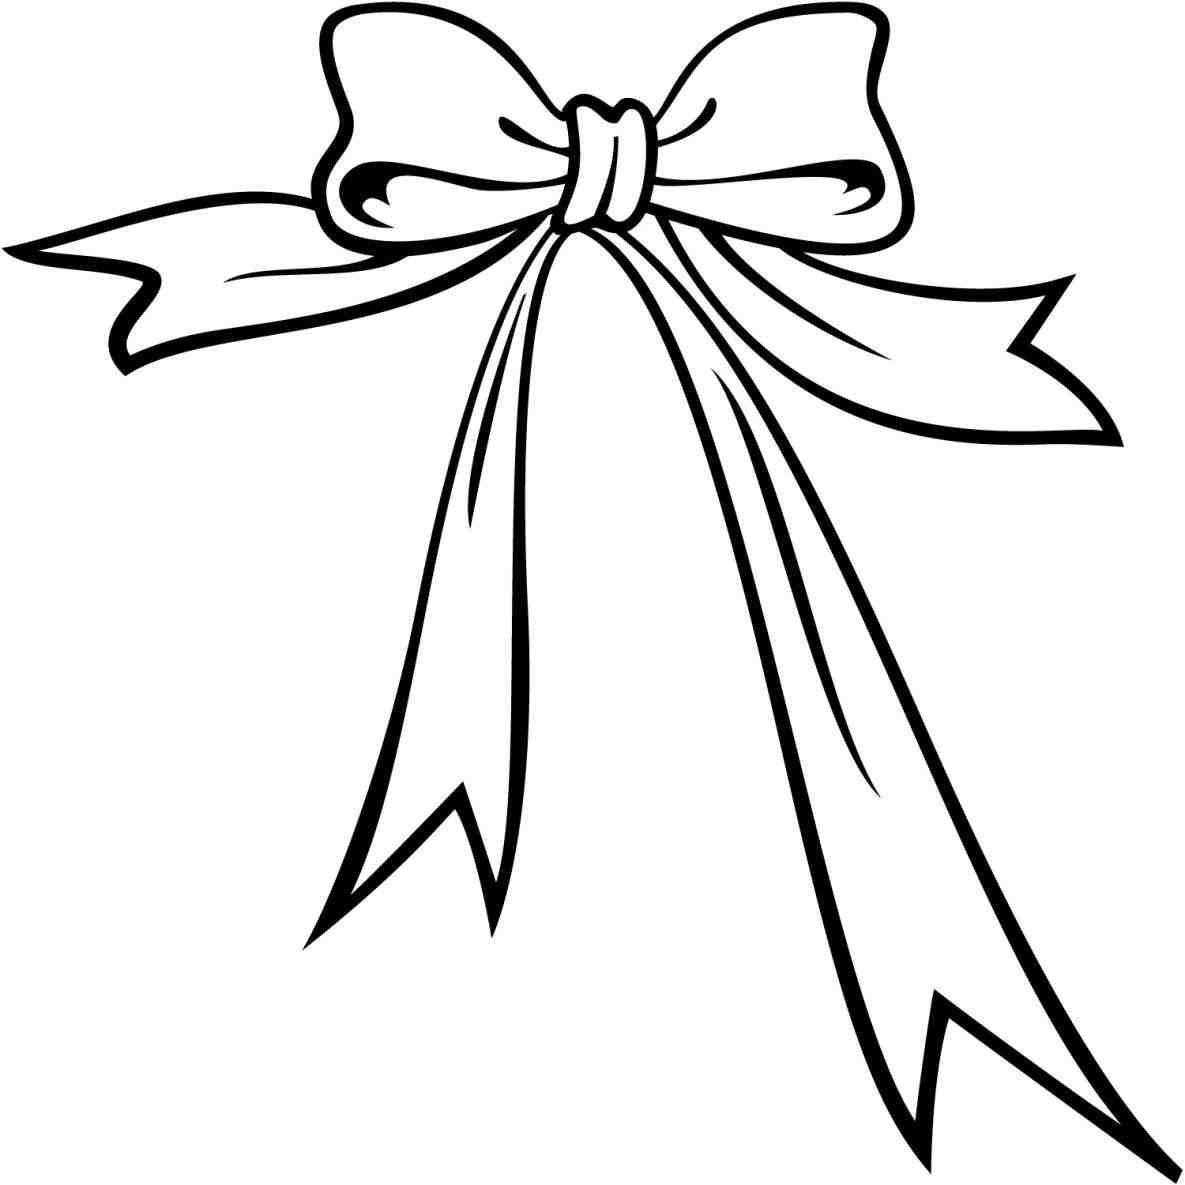 1185x1185 Clipart Christmas Ribbon Drawing Panda Free Images Bow Tie Bow